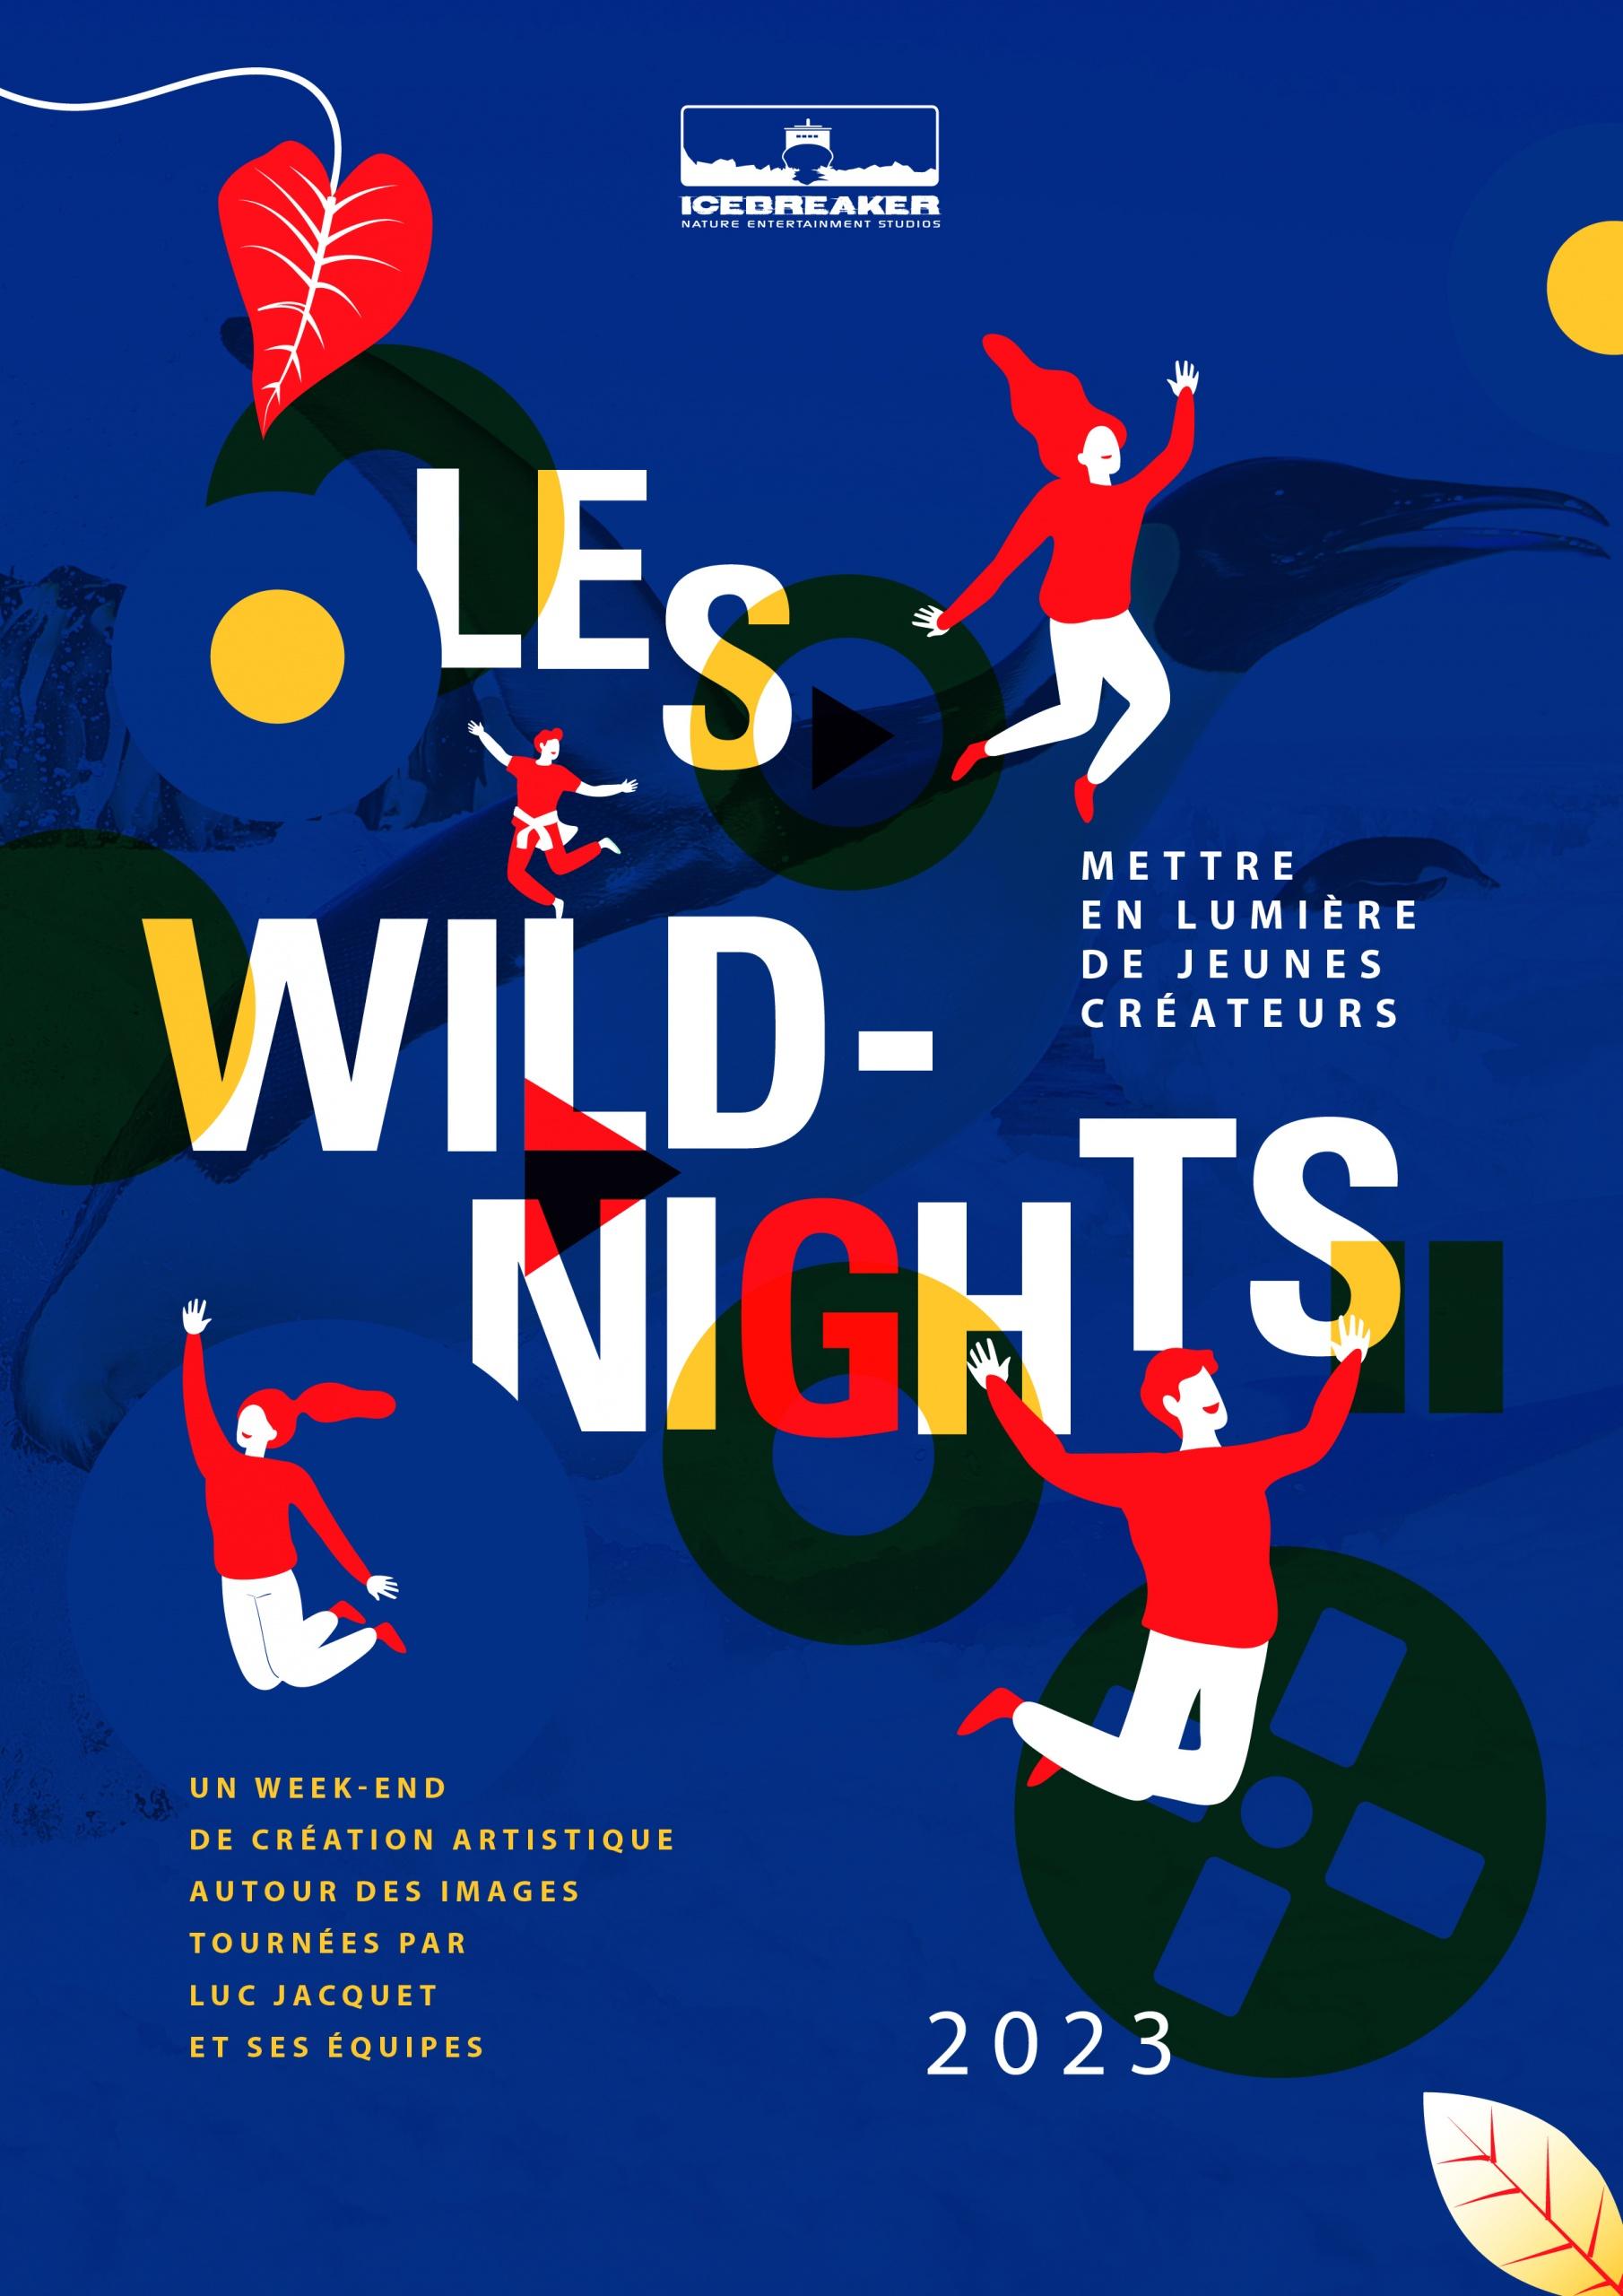 Wildnights